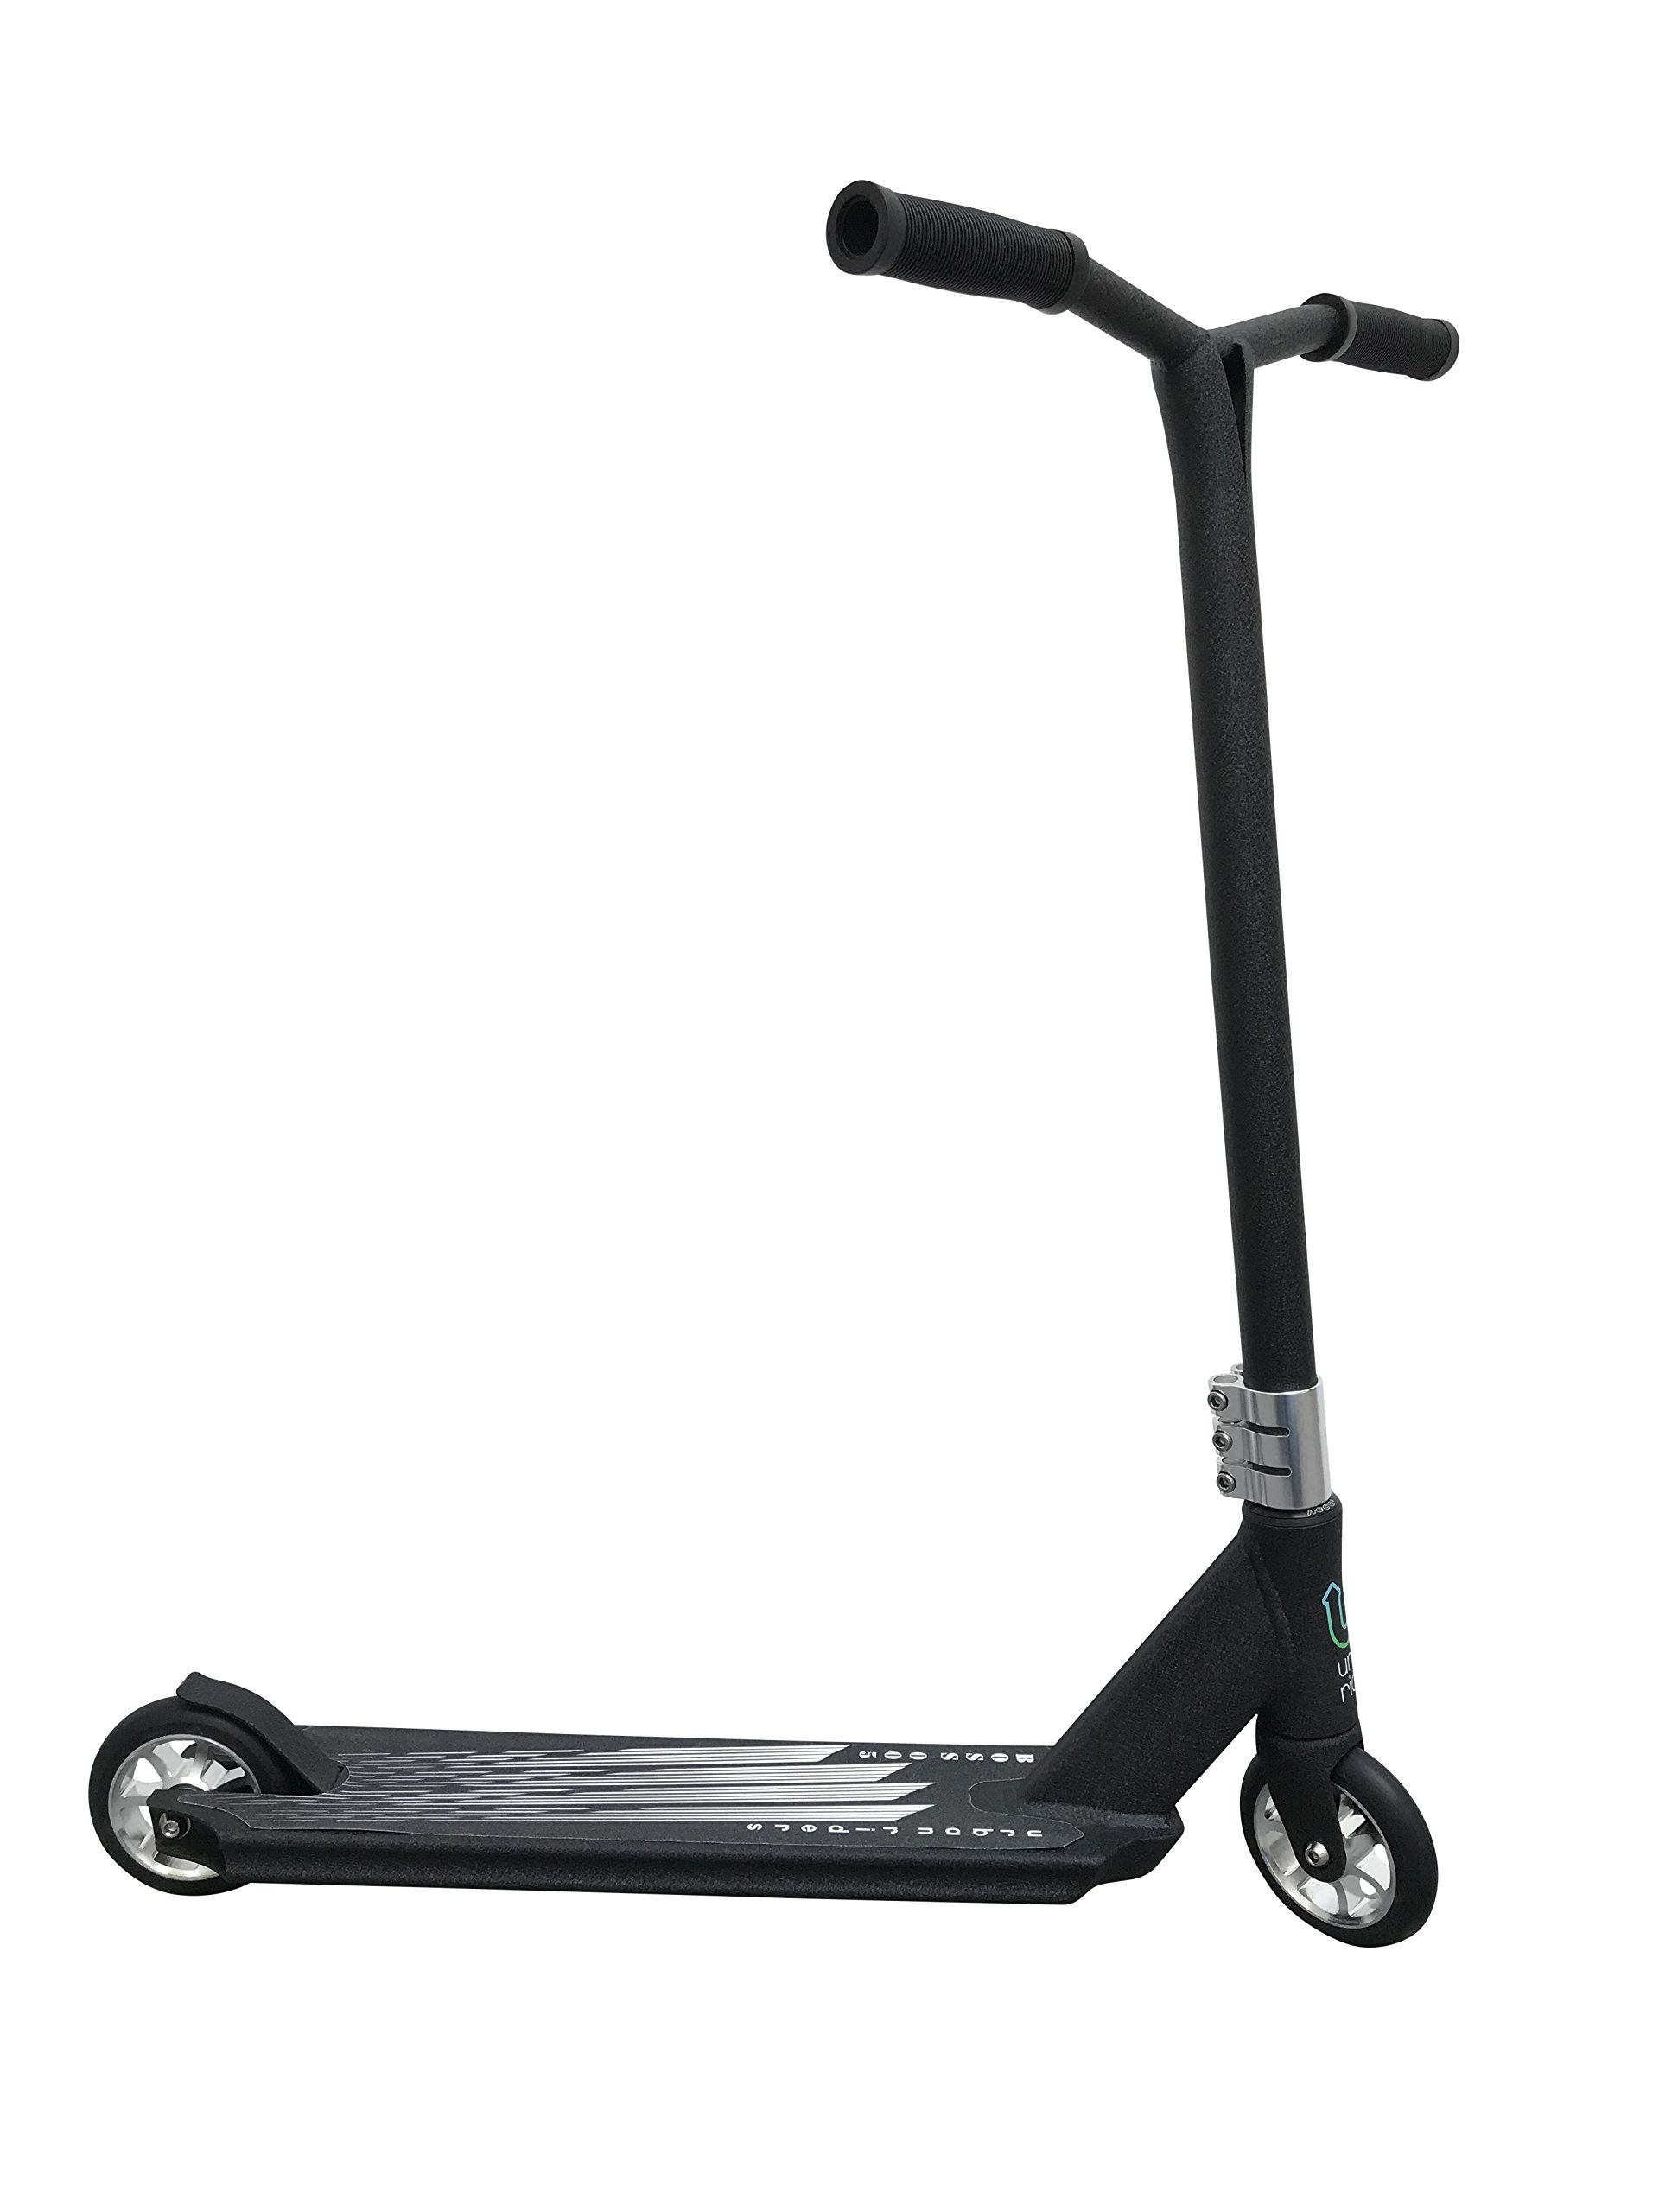 Urban Riders Boss 005 Pro Scooter | Chromoly Handlebar | HIC Compression System | 6061 T6 Aluminum Deck| Triple Clamp USA (Boss 005 Black)